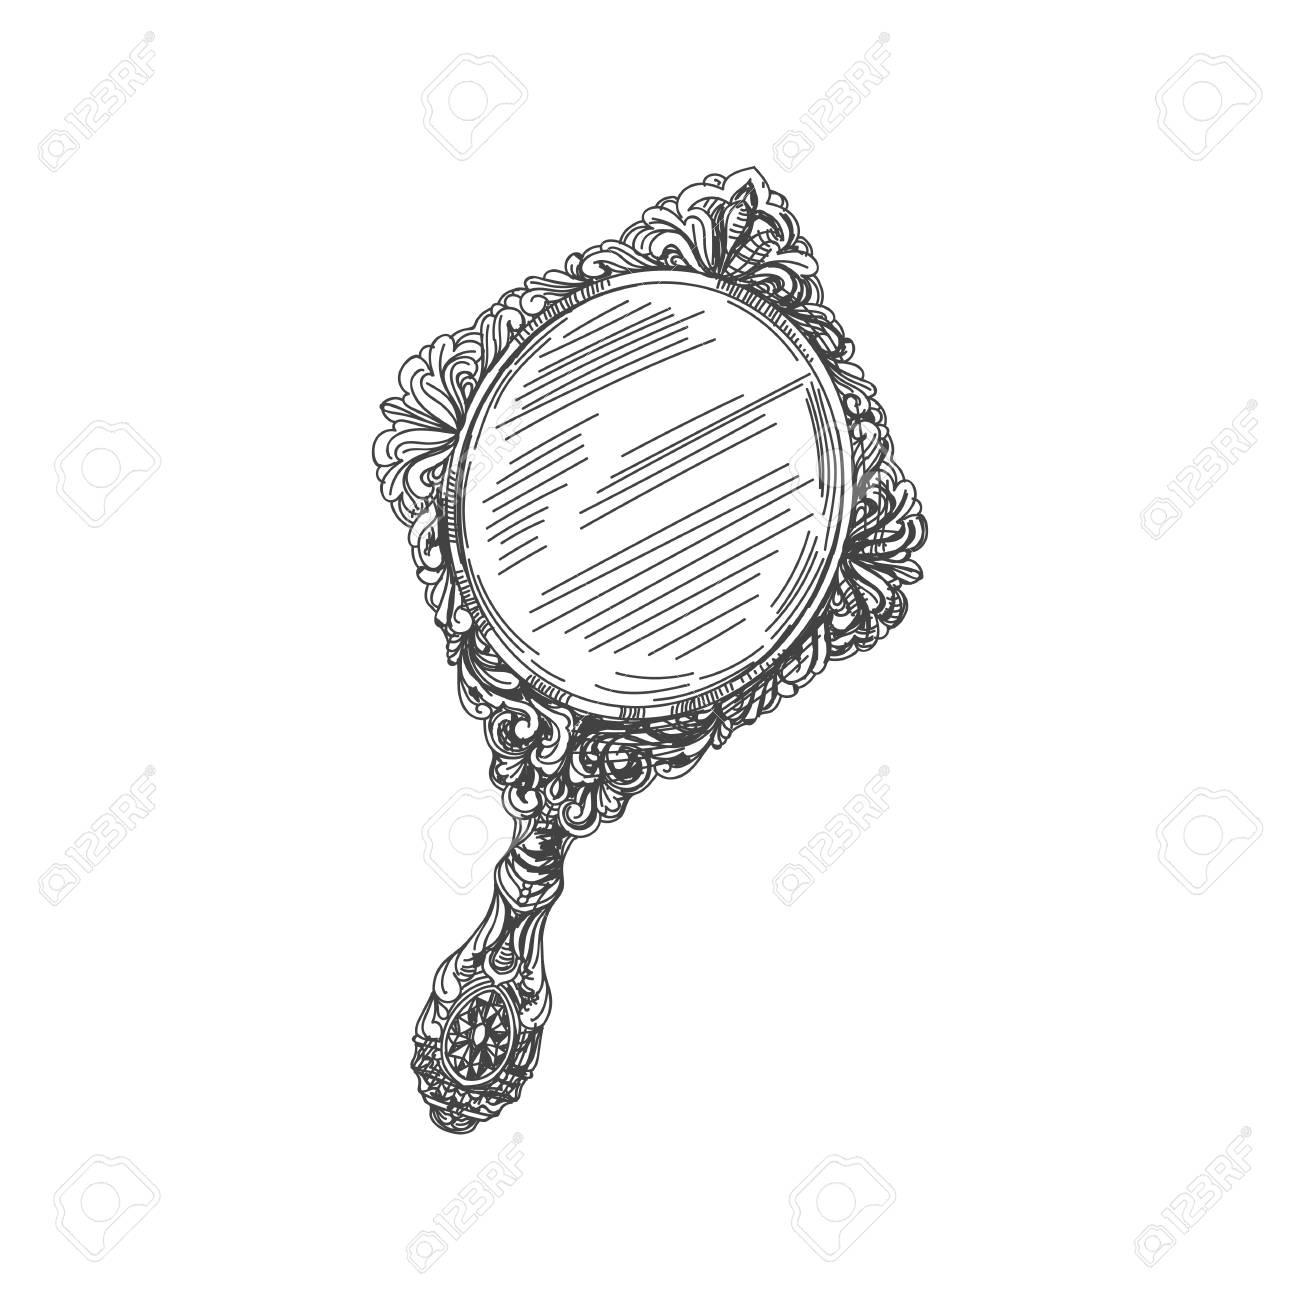 hand mirror sketch. Beautiful Vector Hand Drawn Vintage Mirror Illustration. Detailed Retro Style Image. Sketch Element K